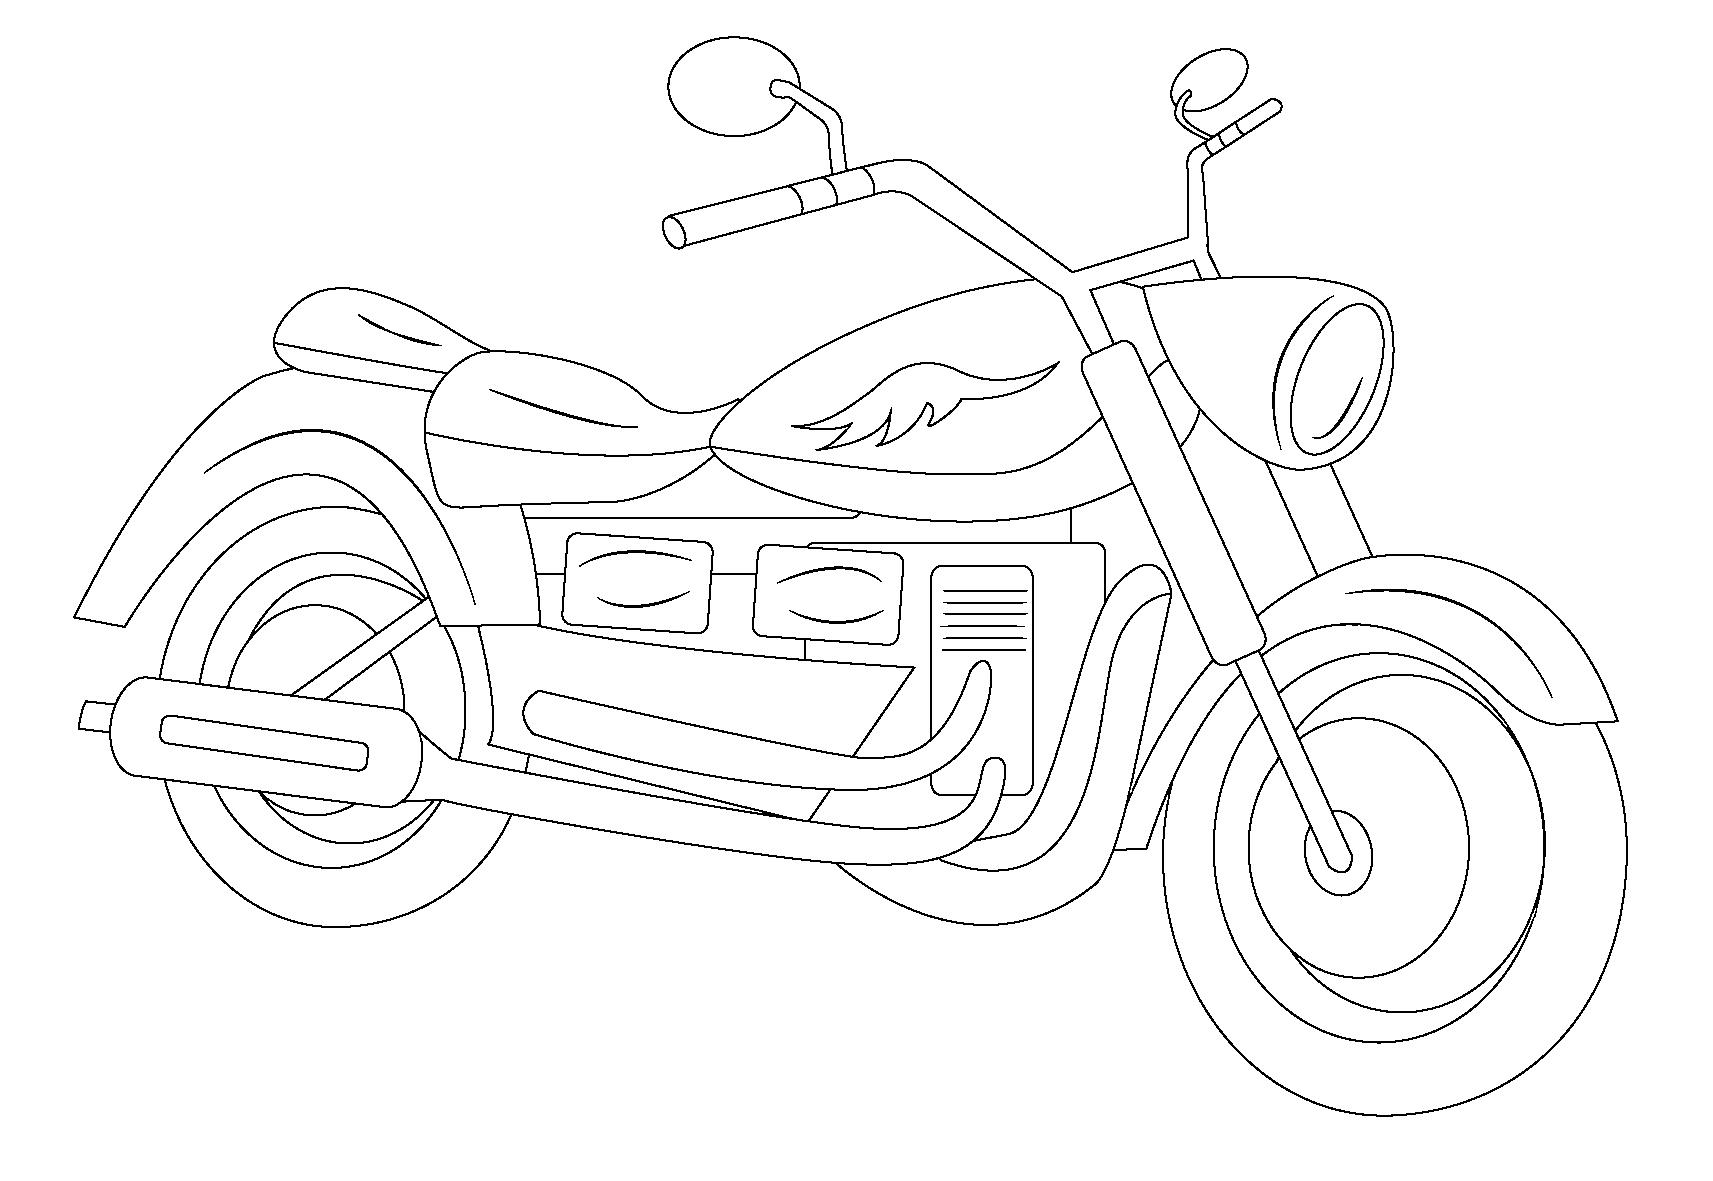 Desenho De Moto Bonita Para Colorir